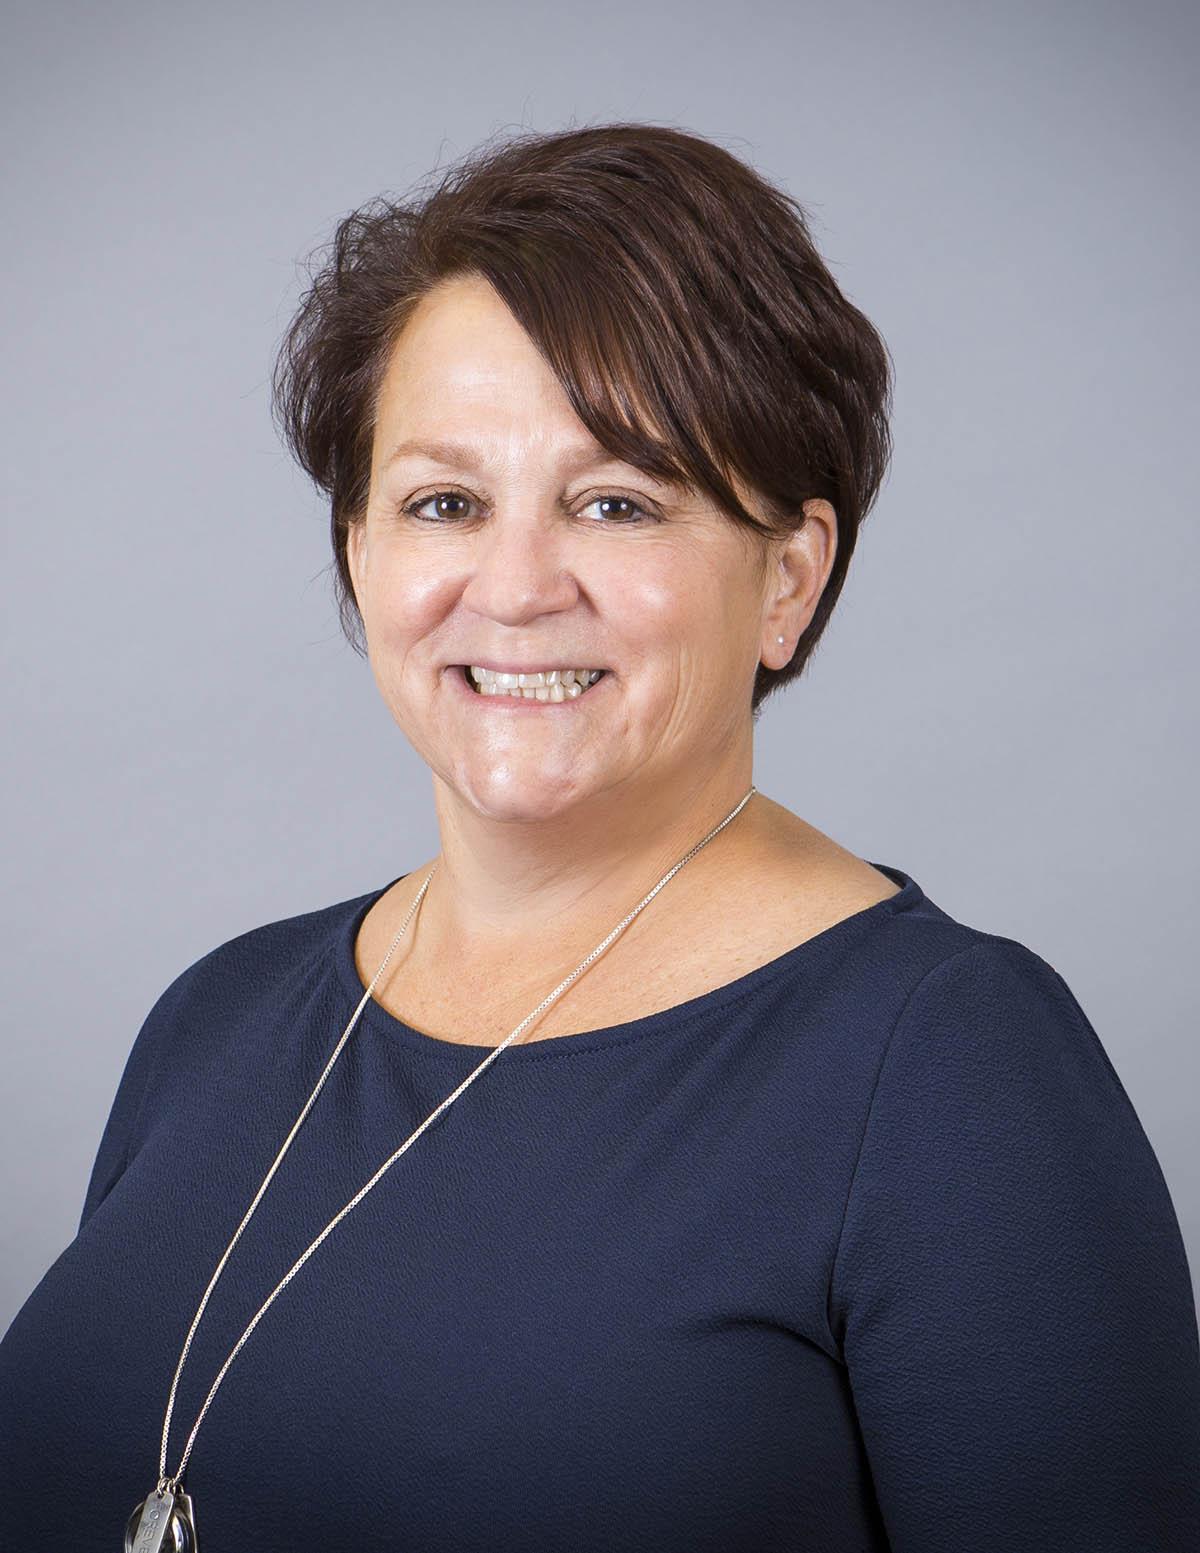 Monona Bank Loan Specialist Carol Maki